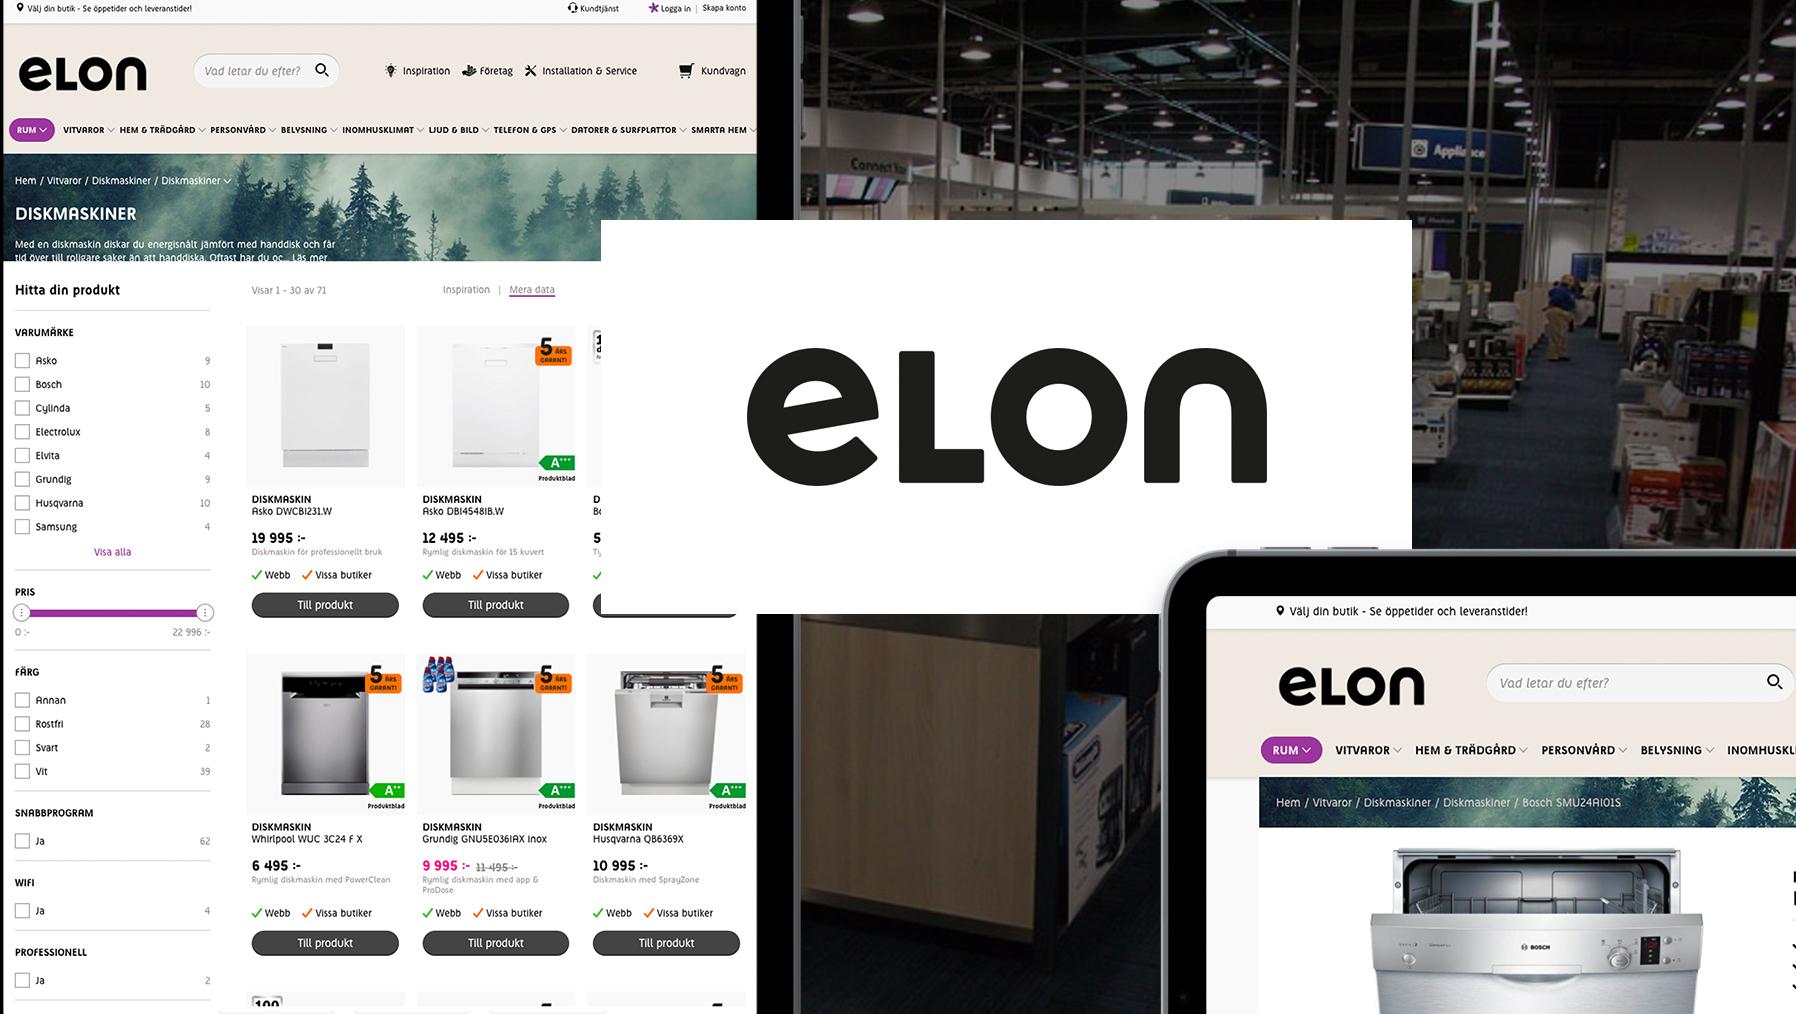 Elon online store